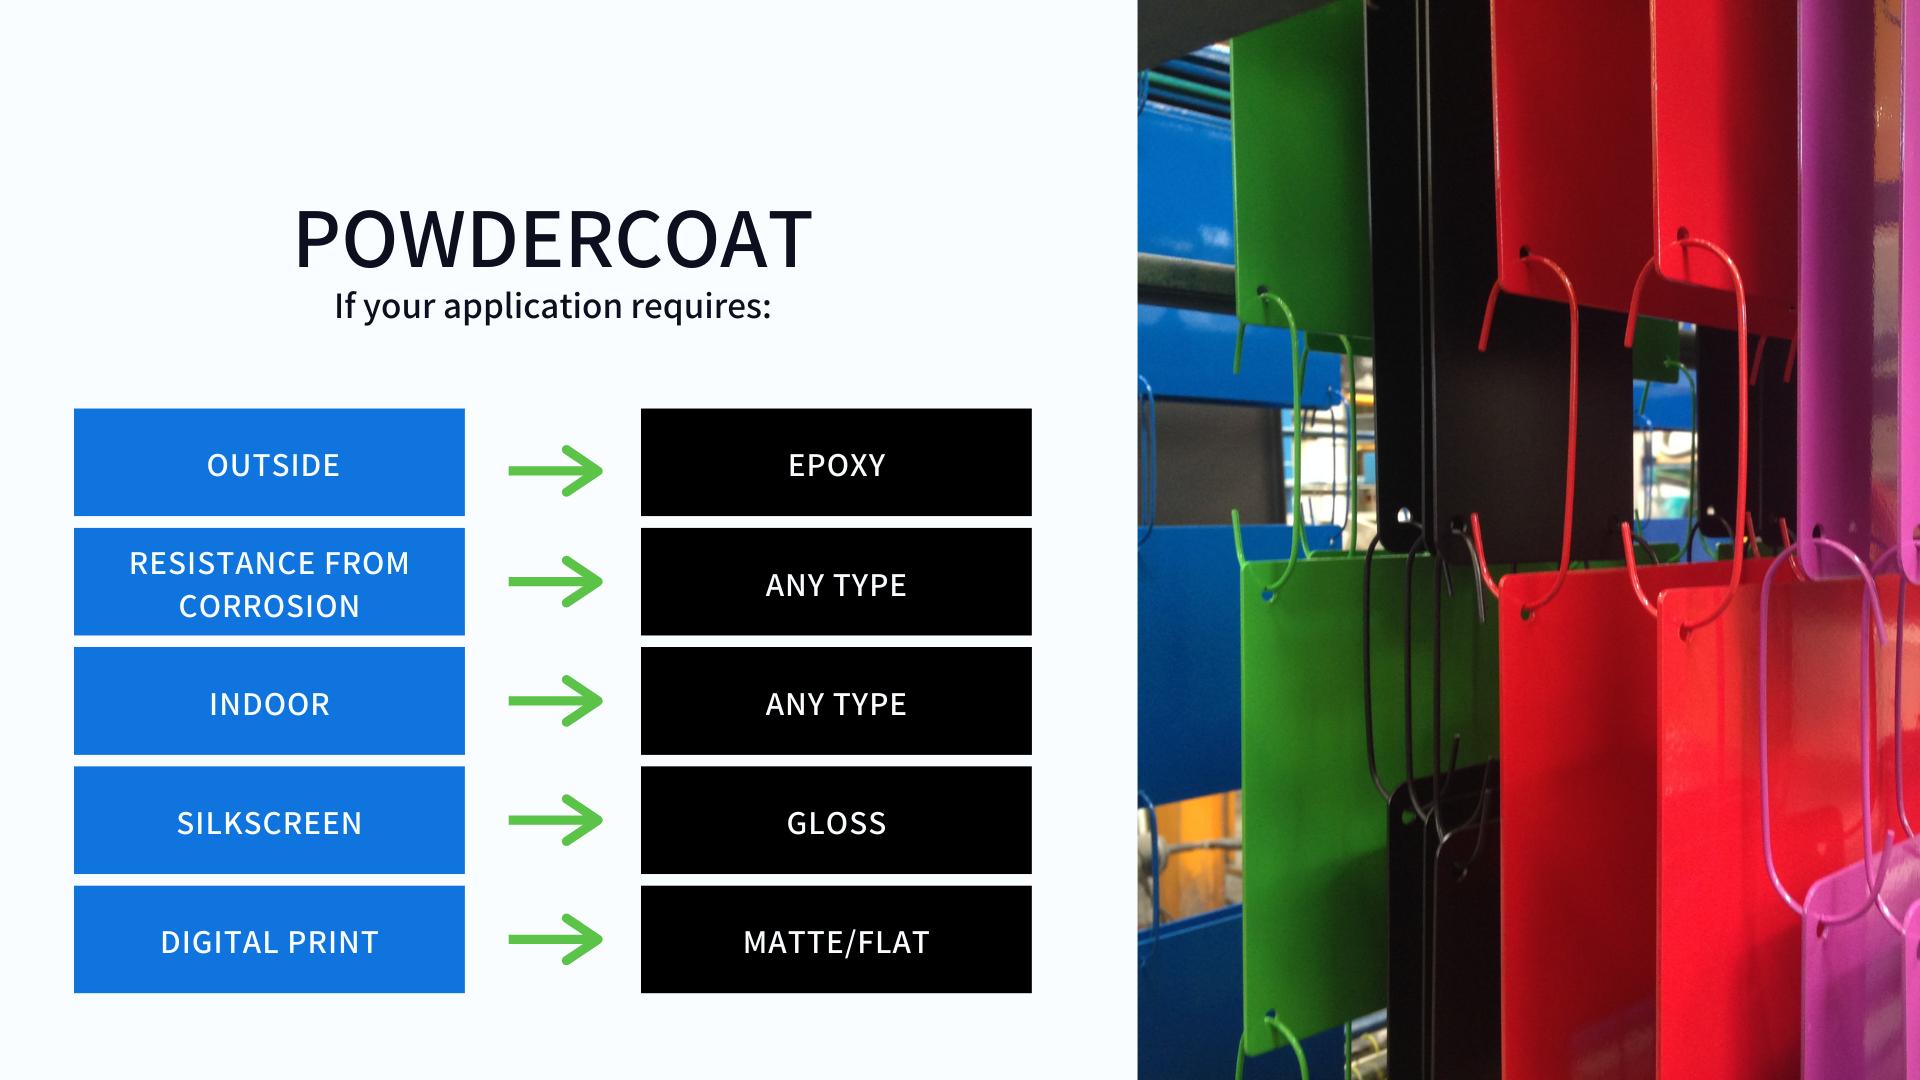 Powdercoat Textures & Use Cases